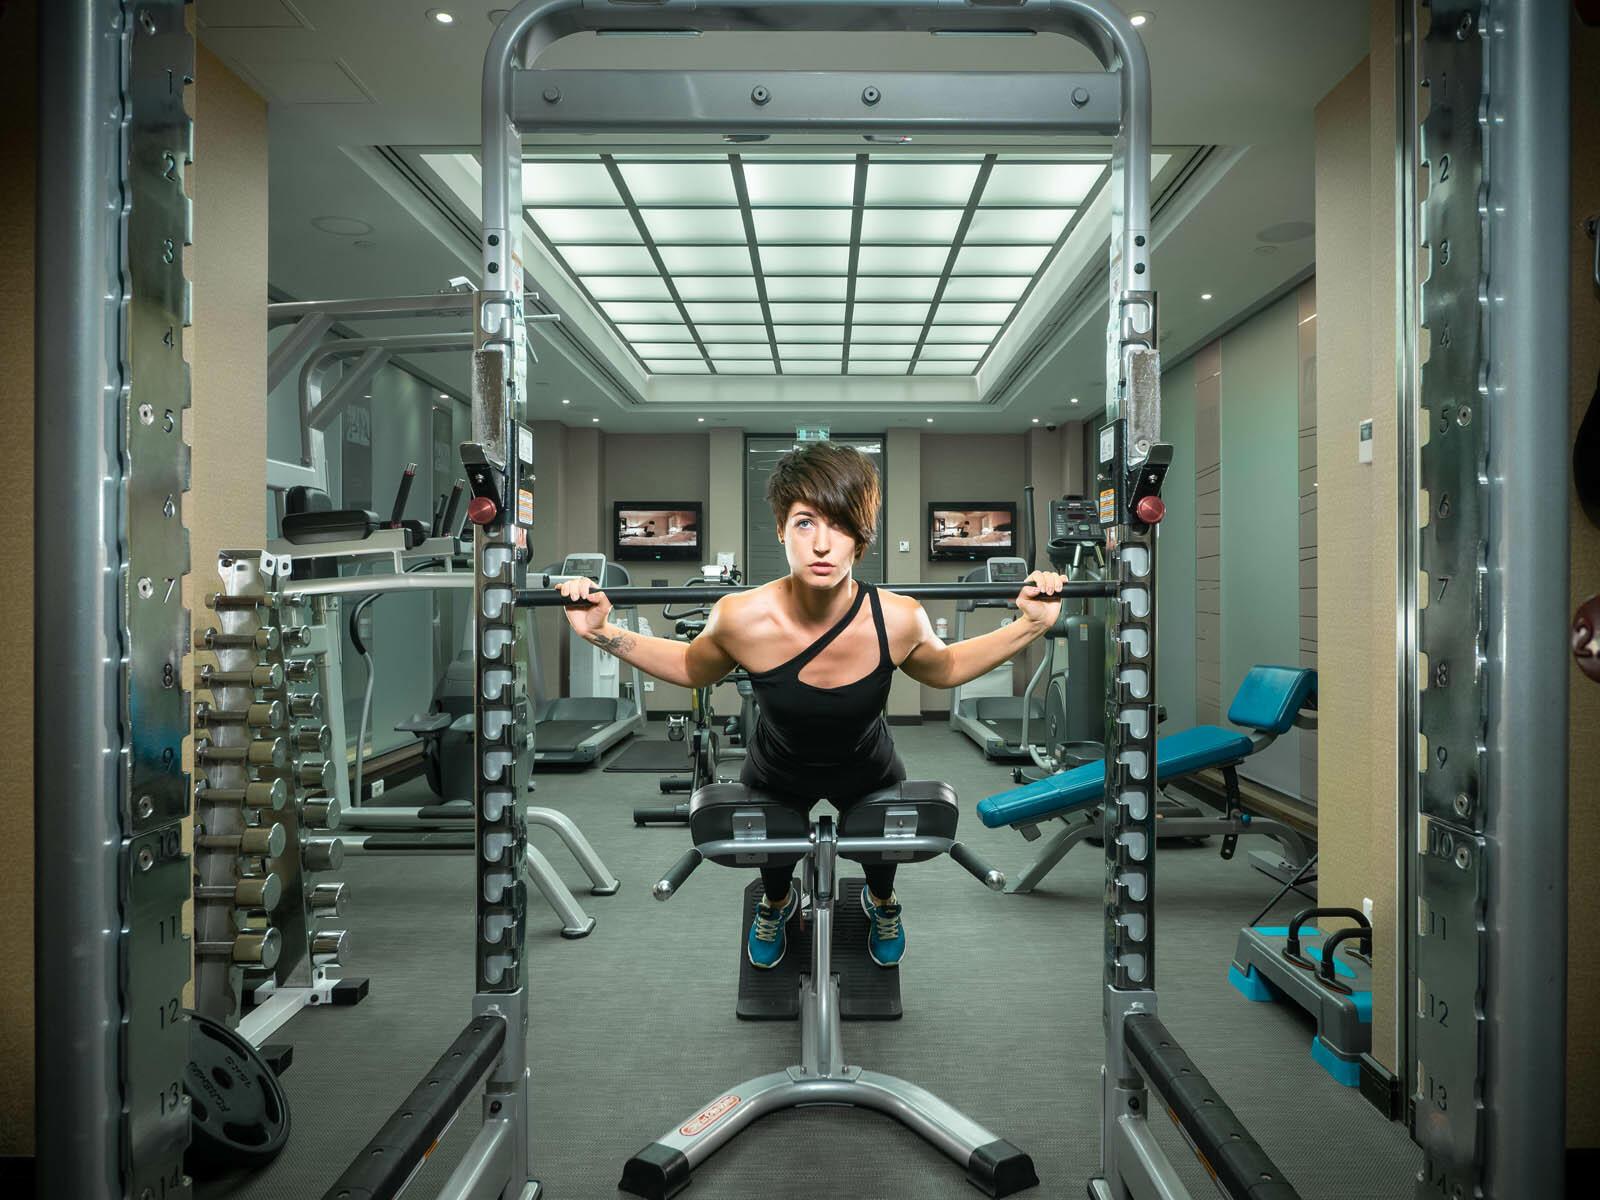 Fitness center in  Intercontinental Kyiv hotel